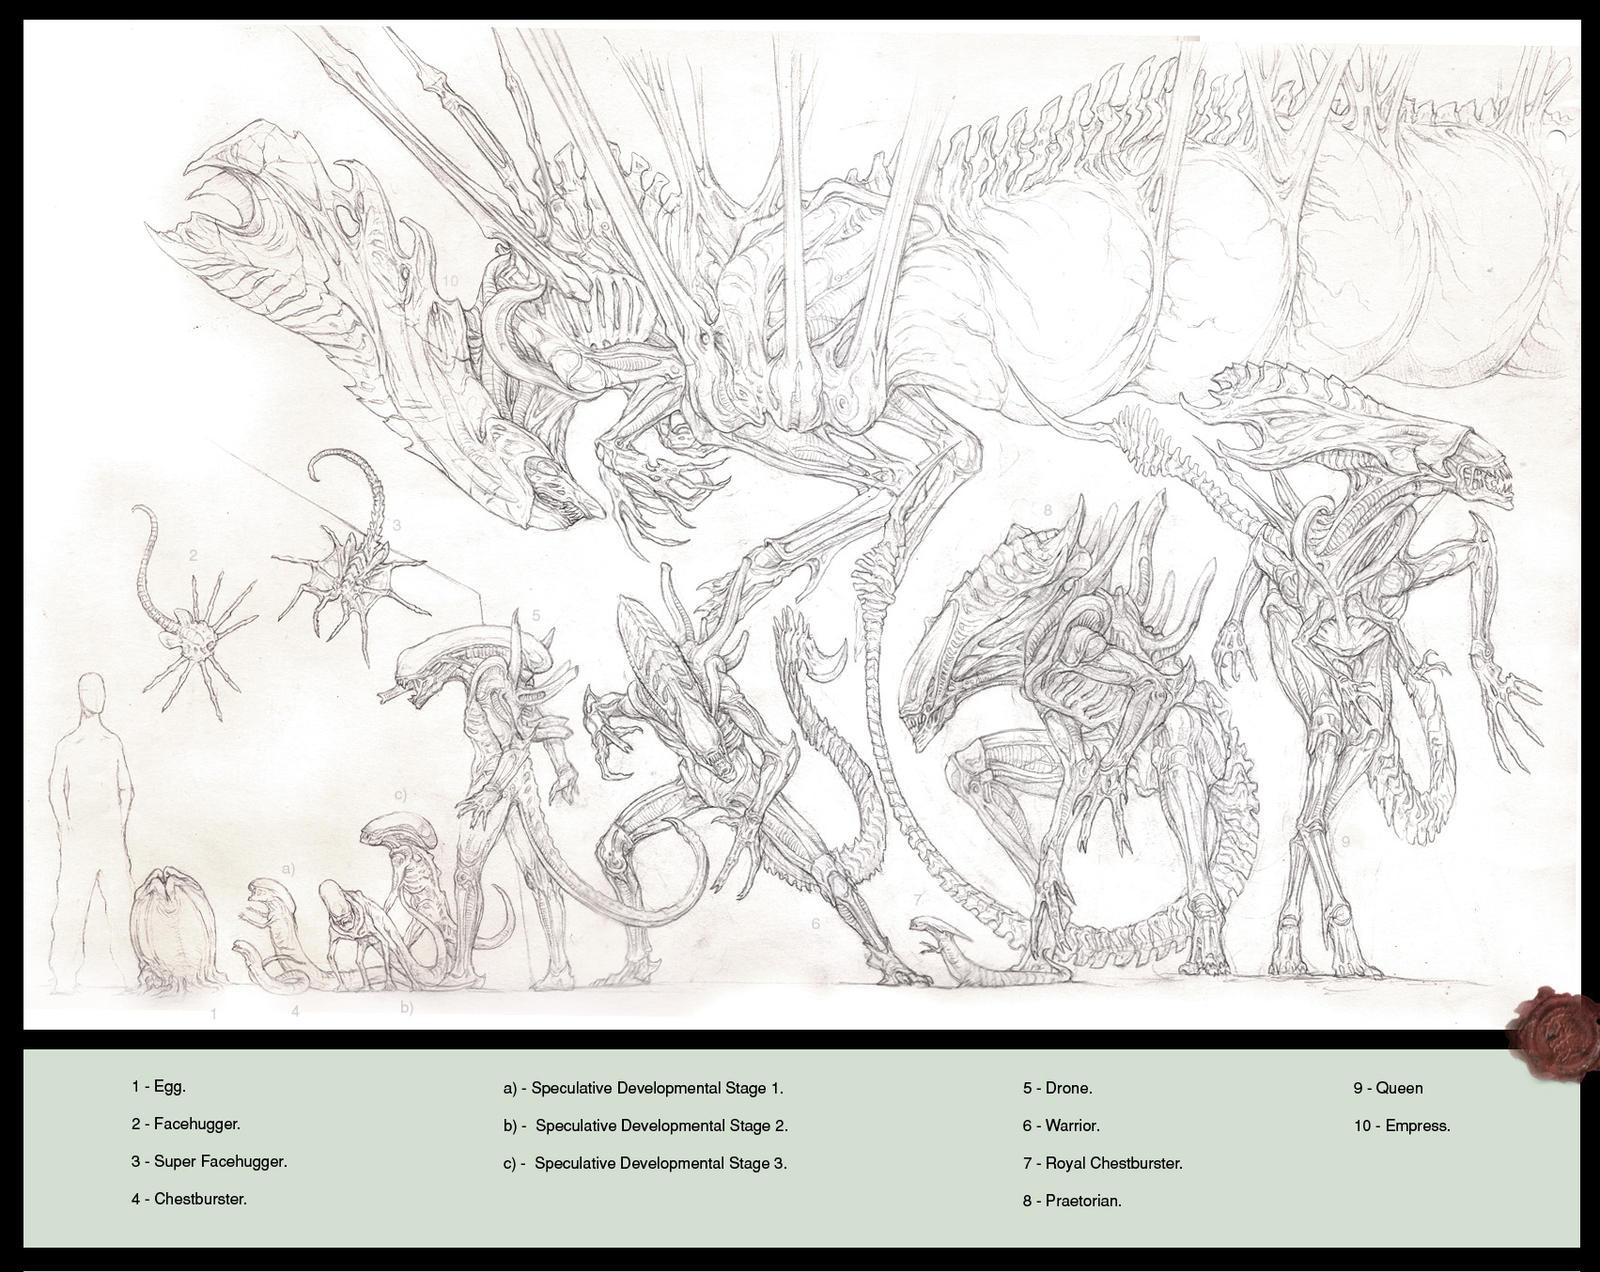 Alien vs Predator Miniatures Game, Prodos loses license to